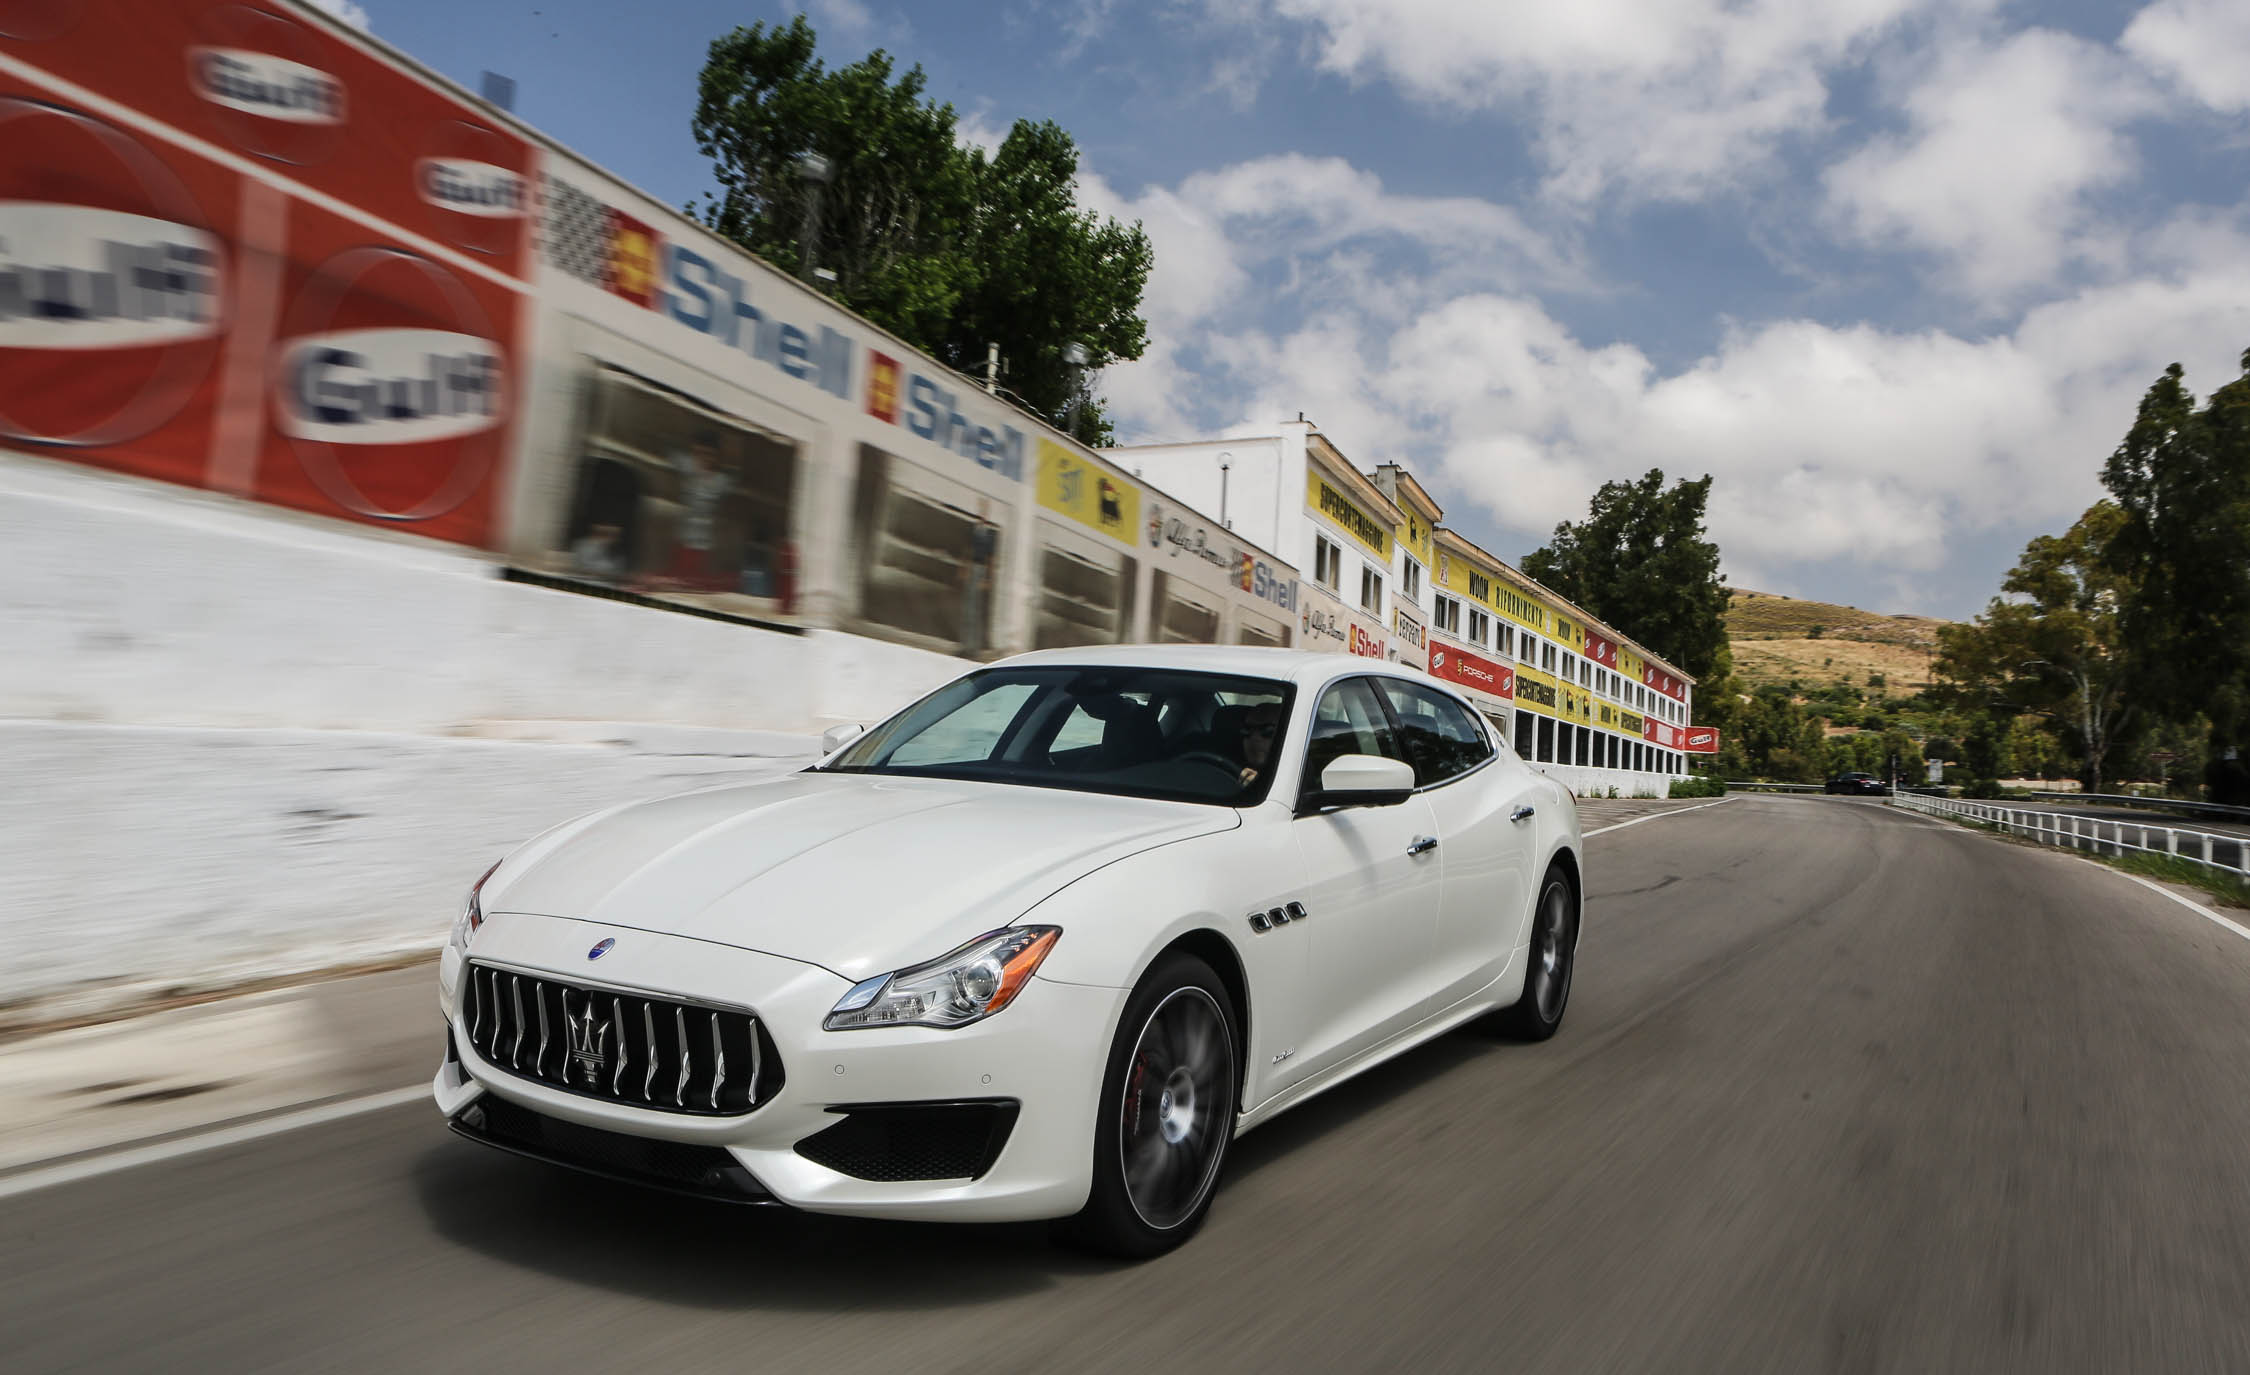 2017 Maserati Quattroporte GTS GranSport (View 55 of 55)